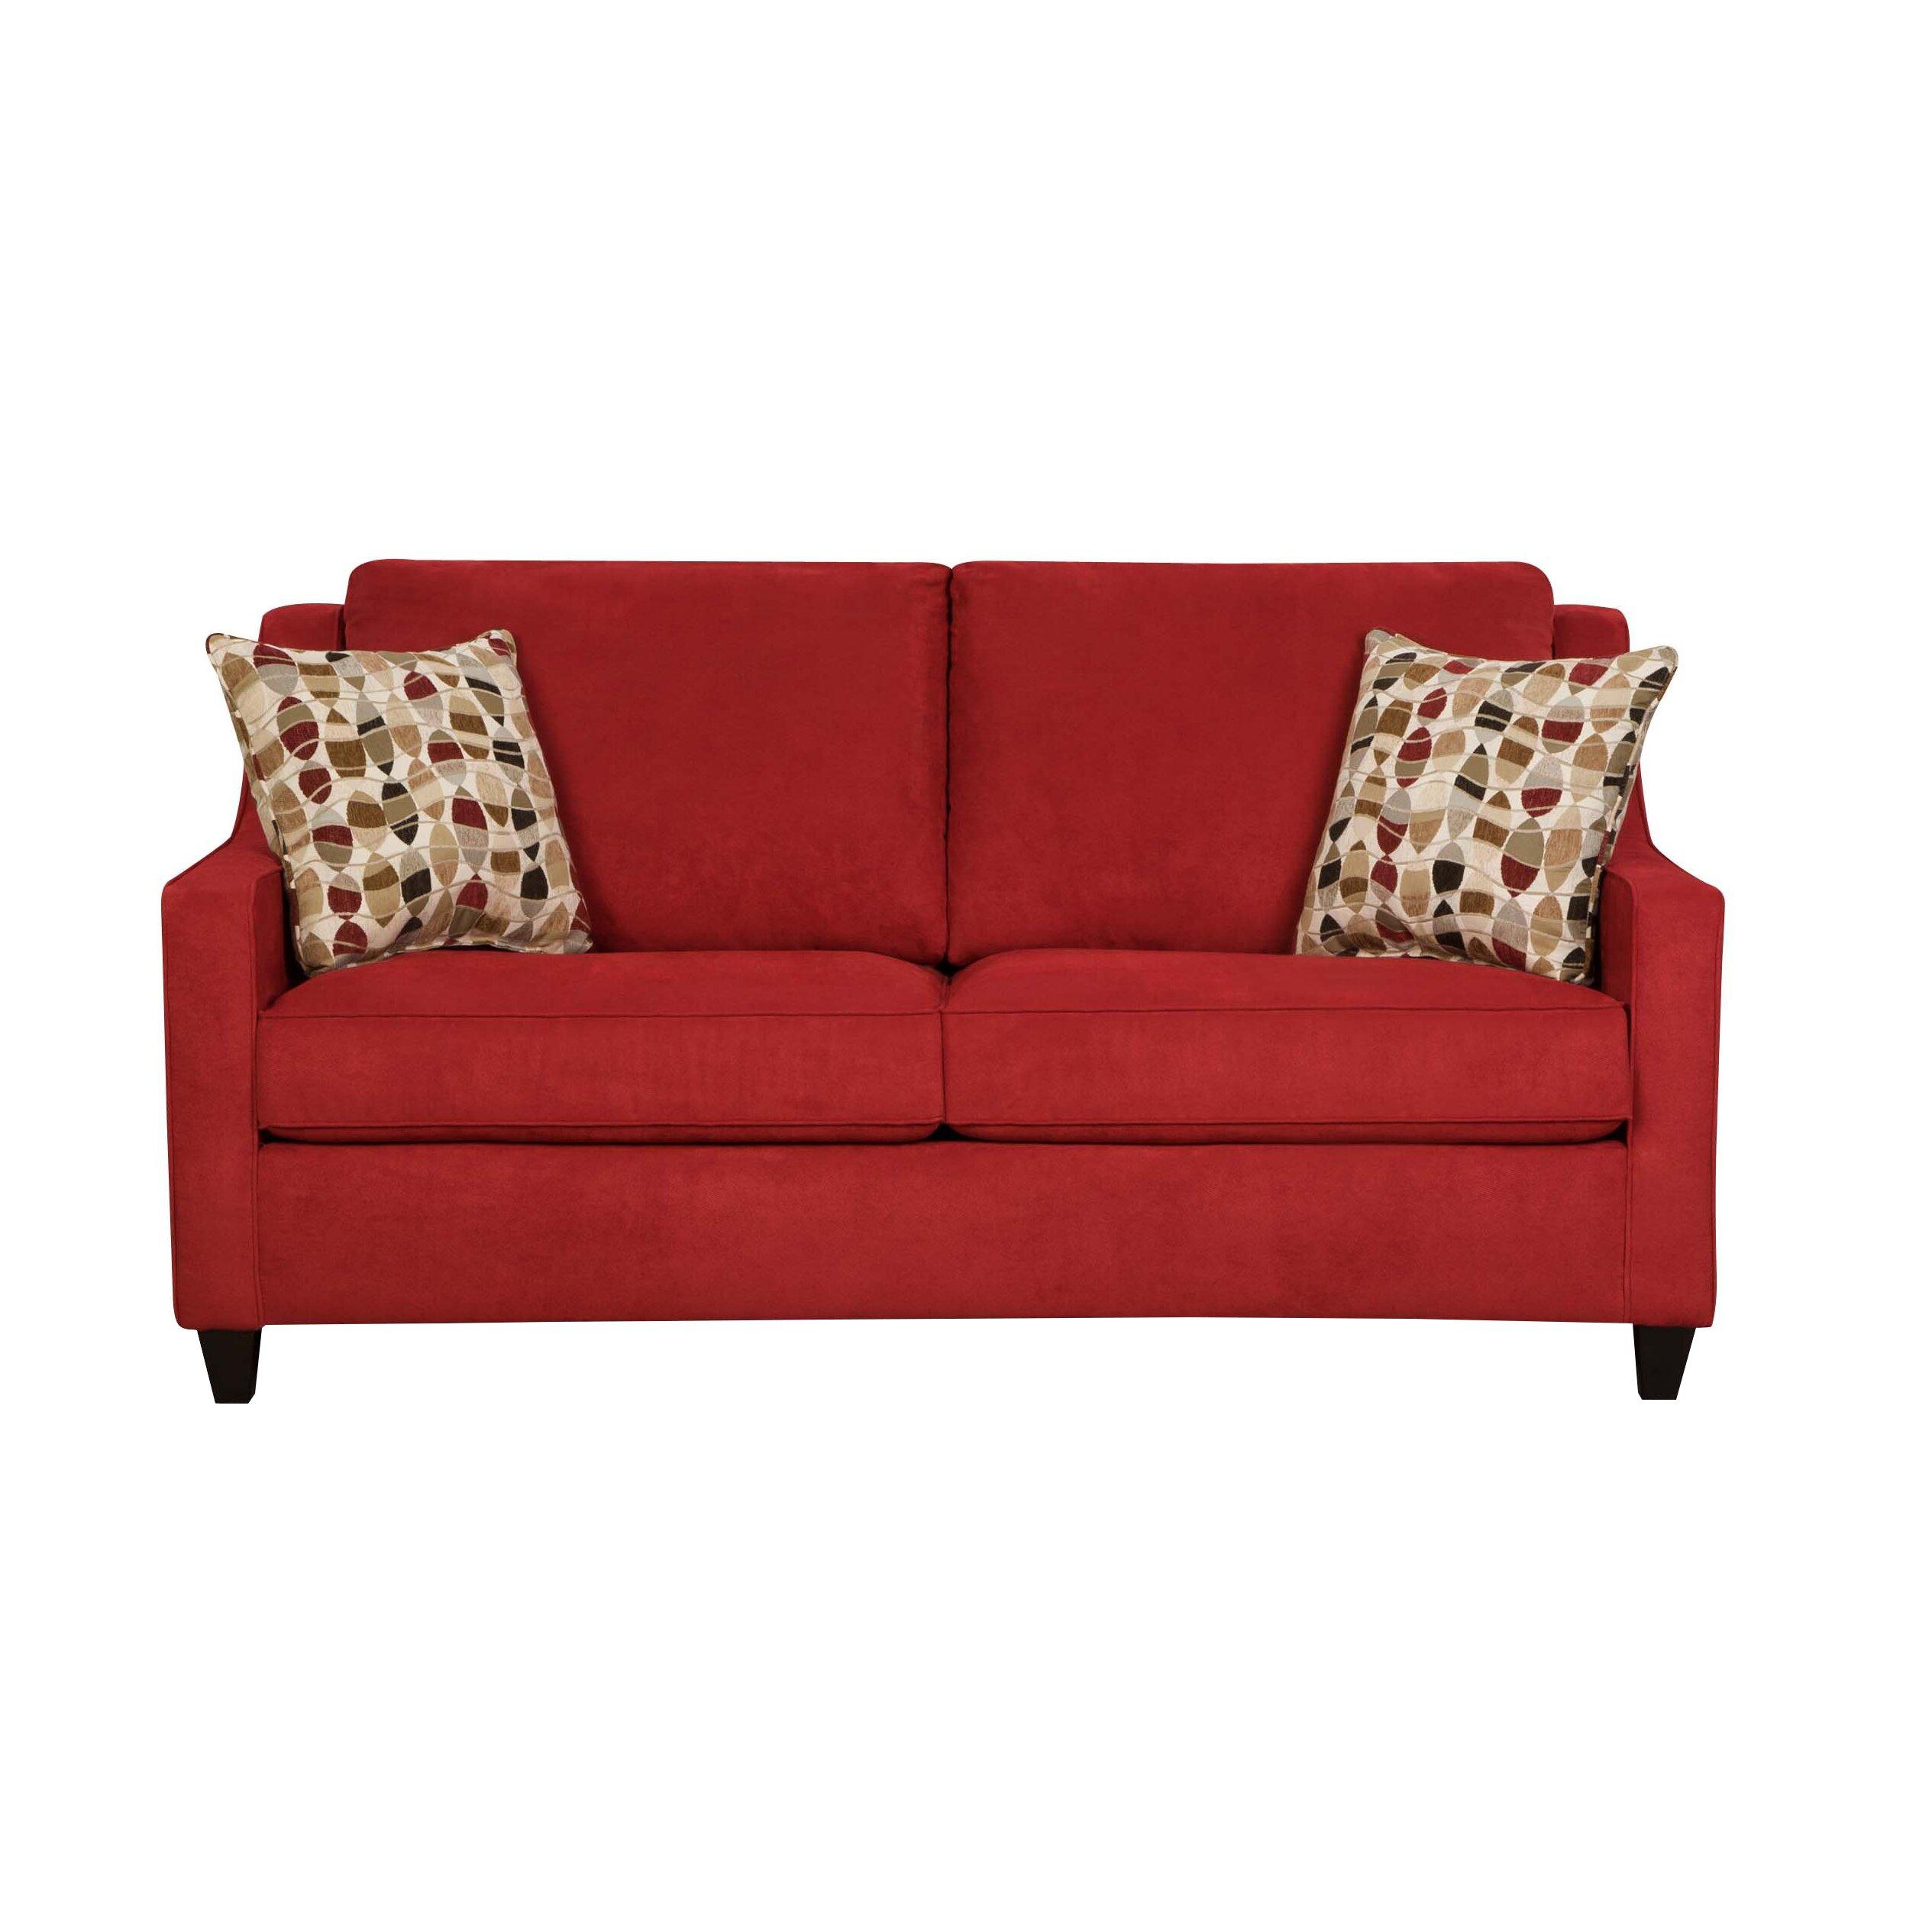 Simmons Upholstery Twillo Twin Sleeper Sofa & Reviews ...